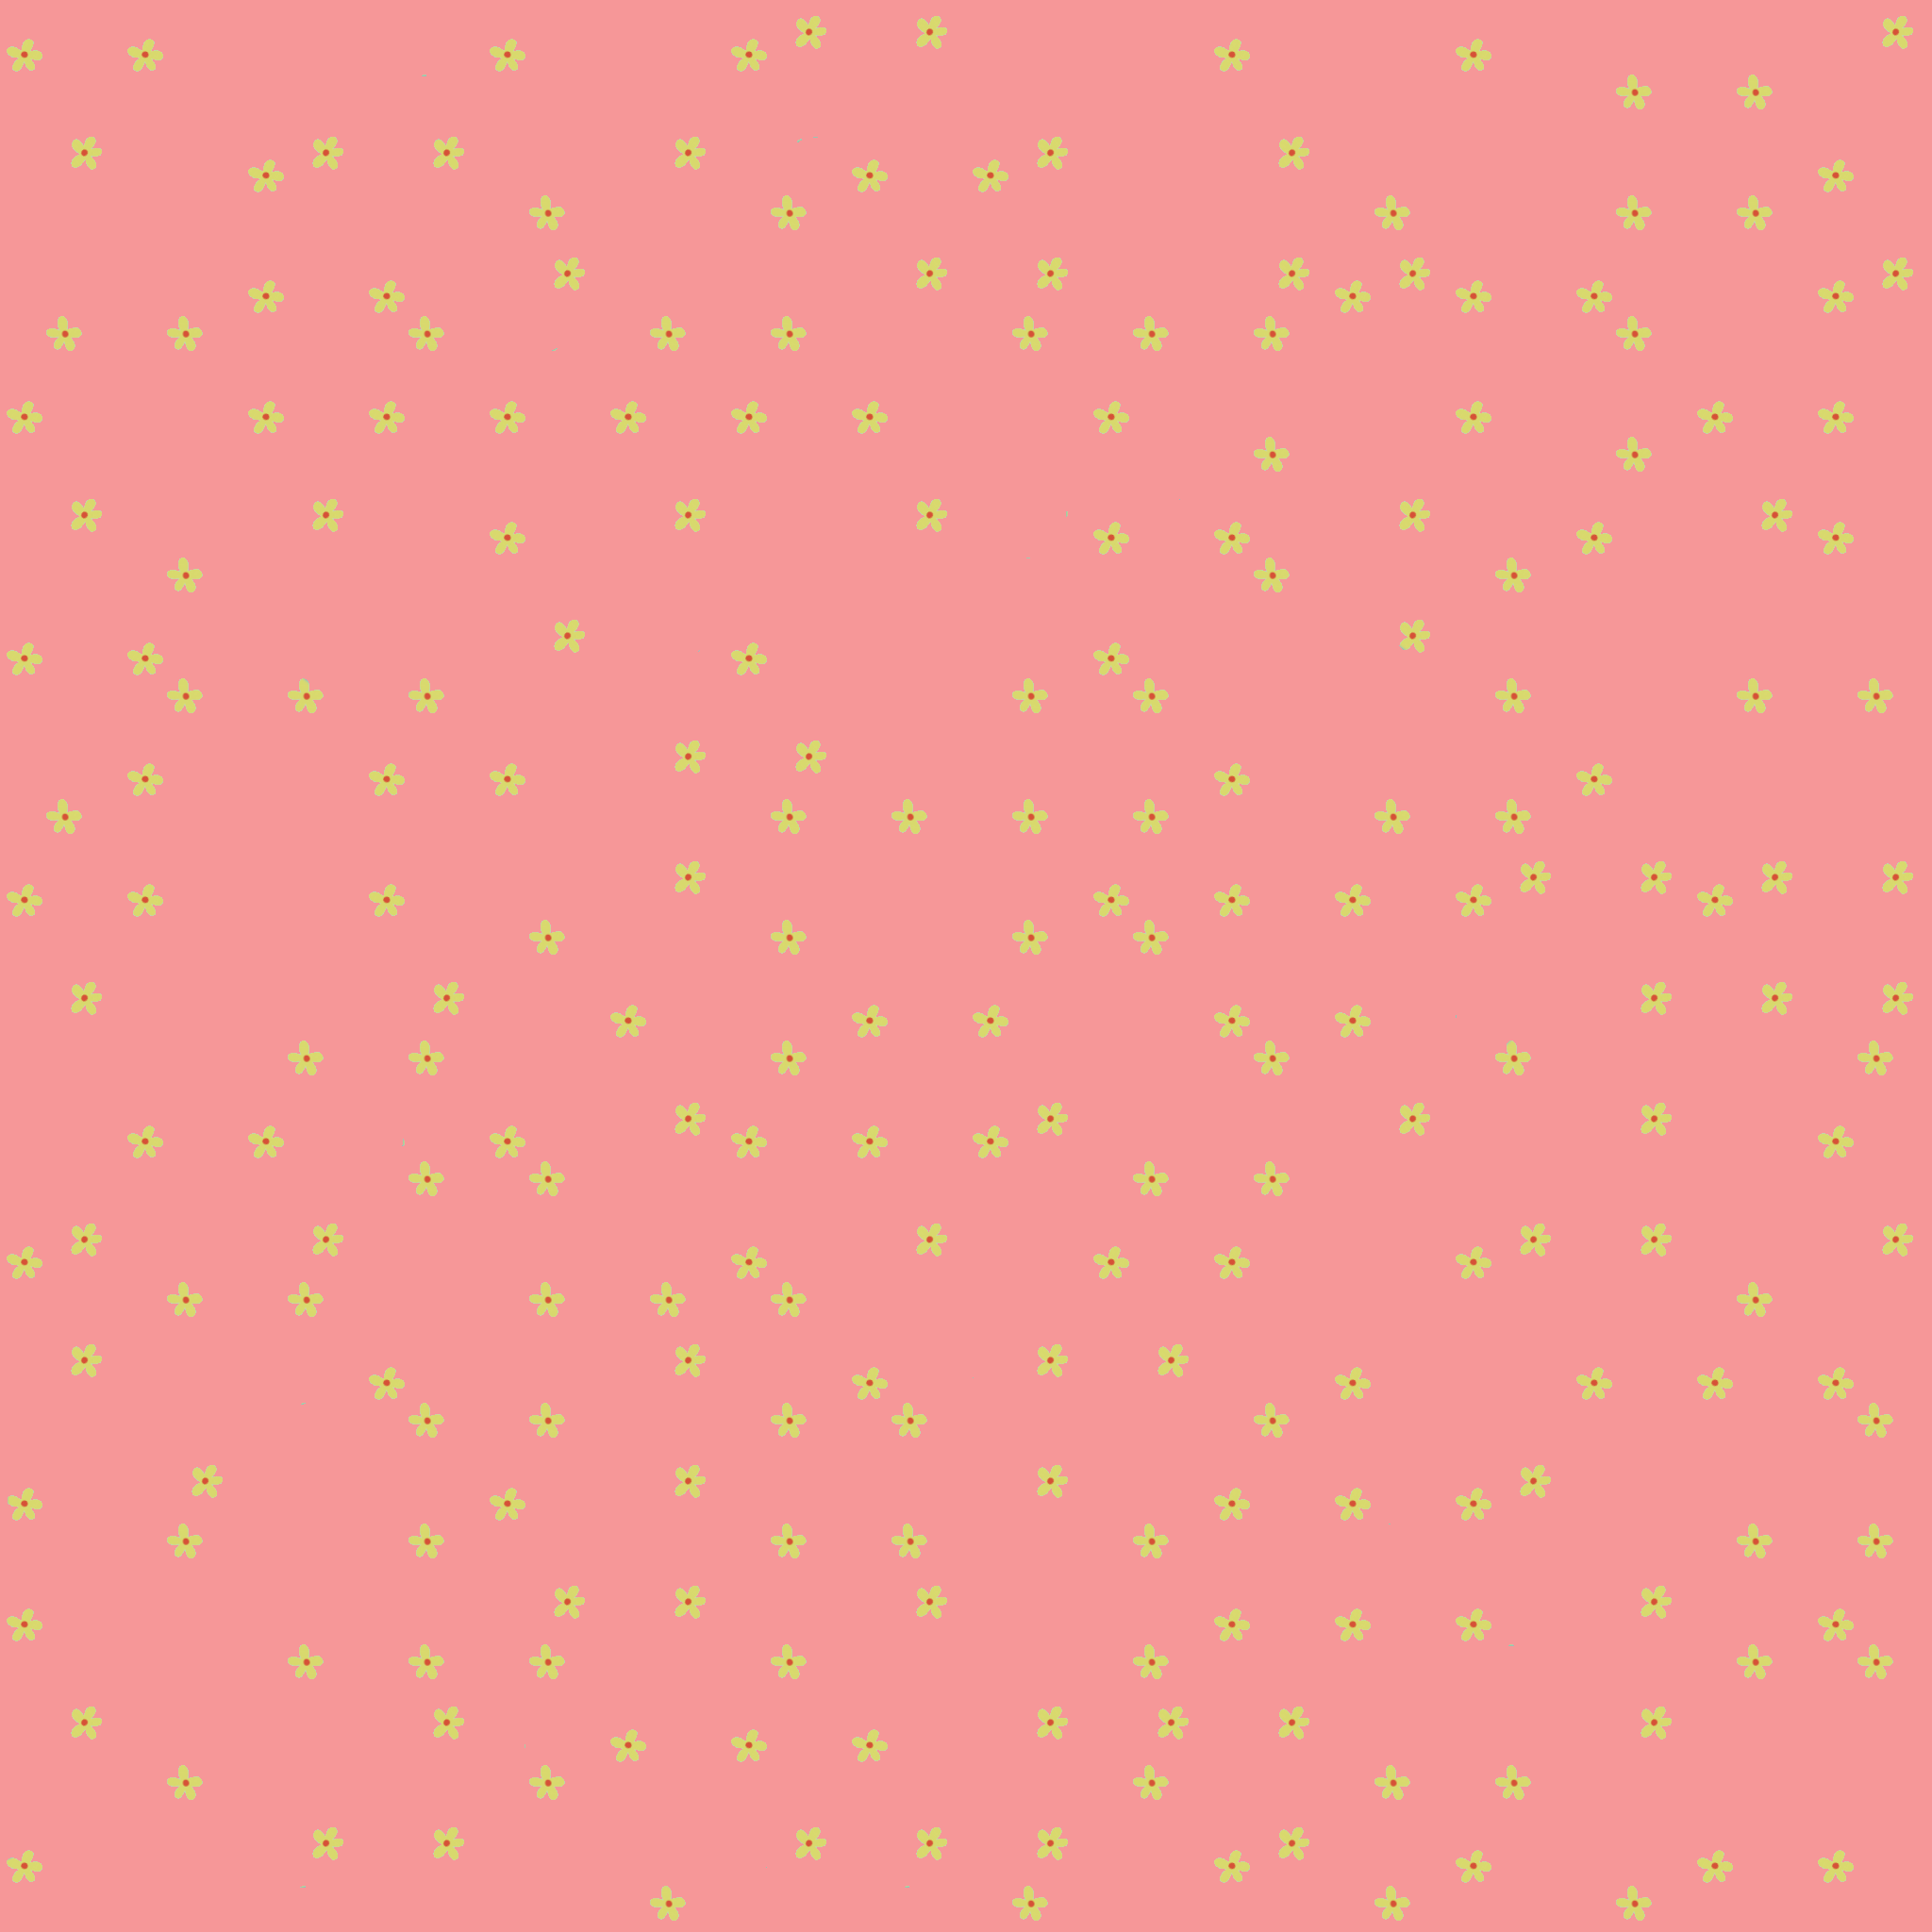 bloemetjes achtergrond roze